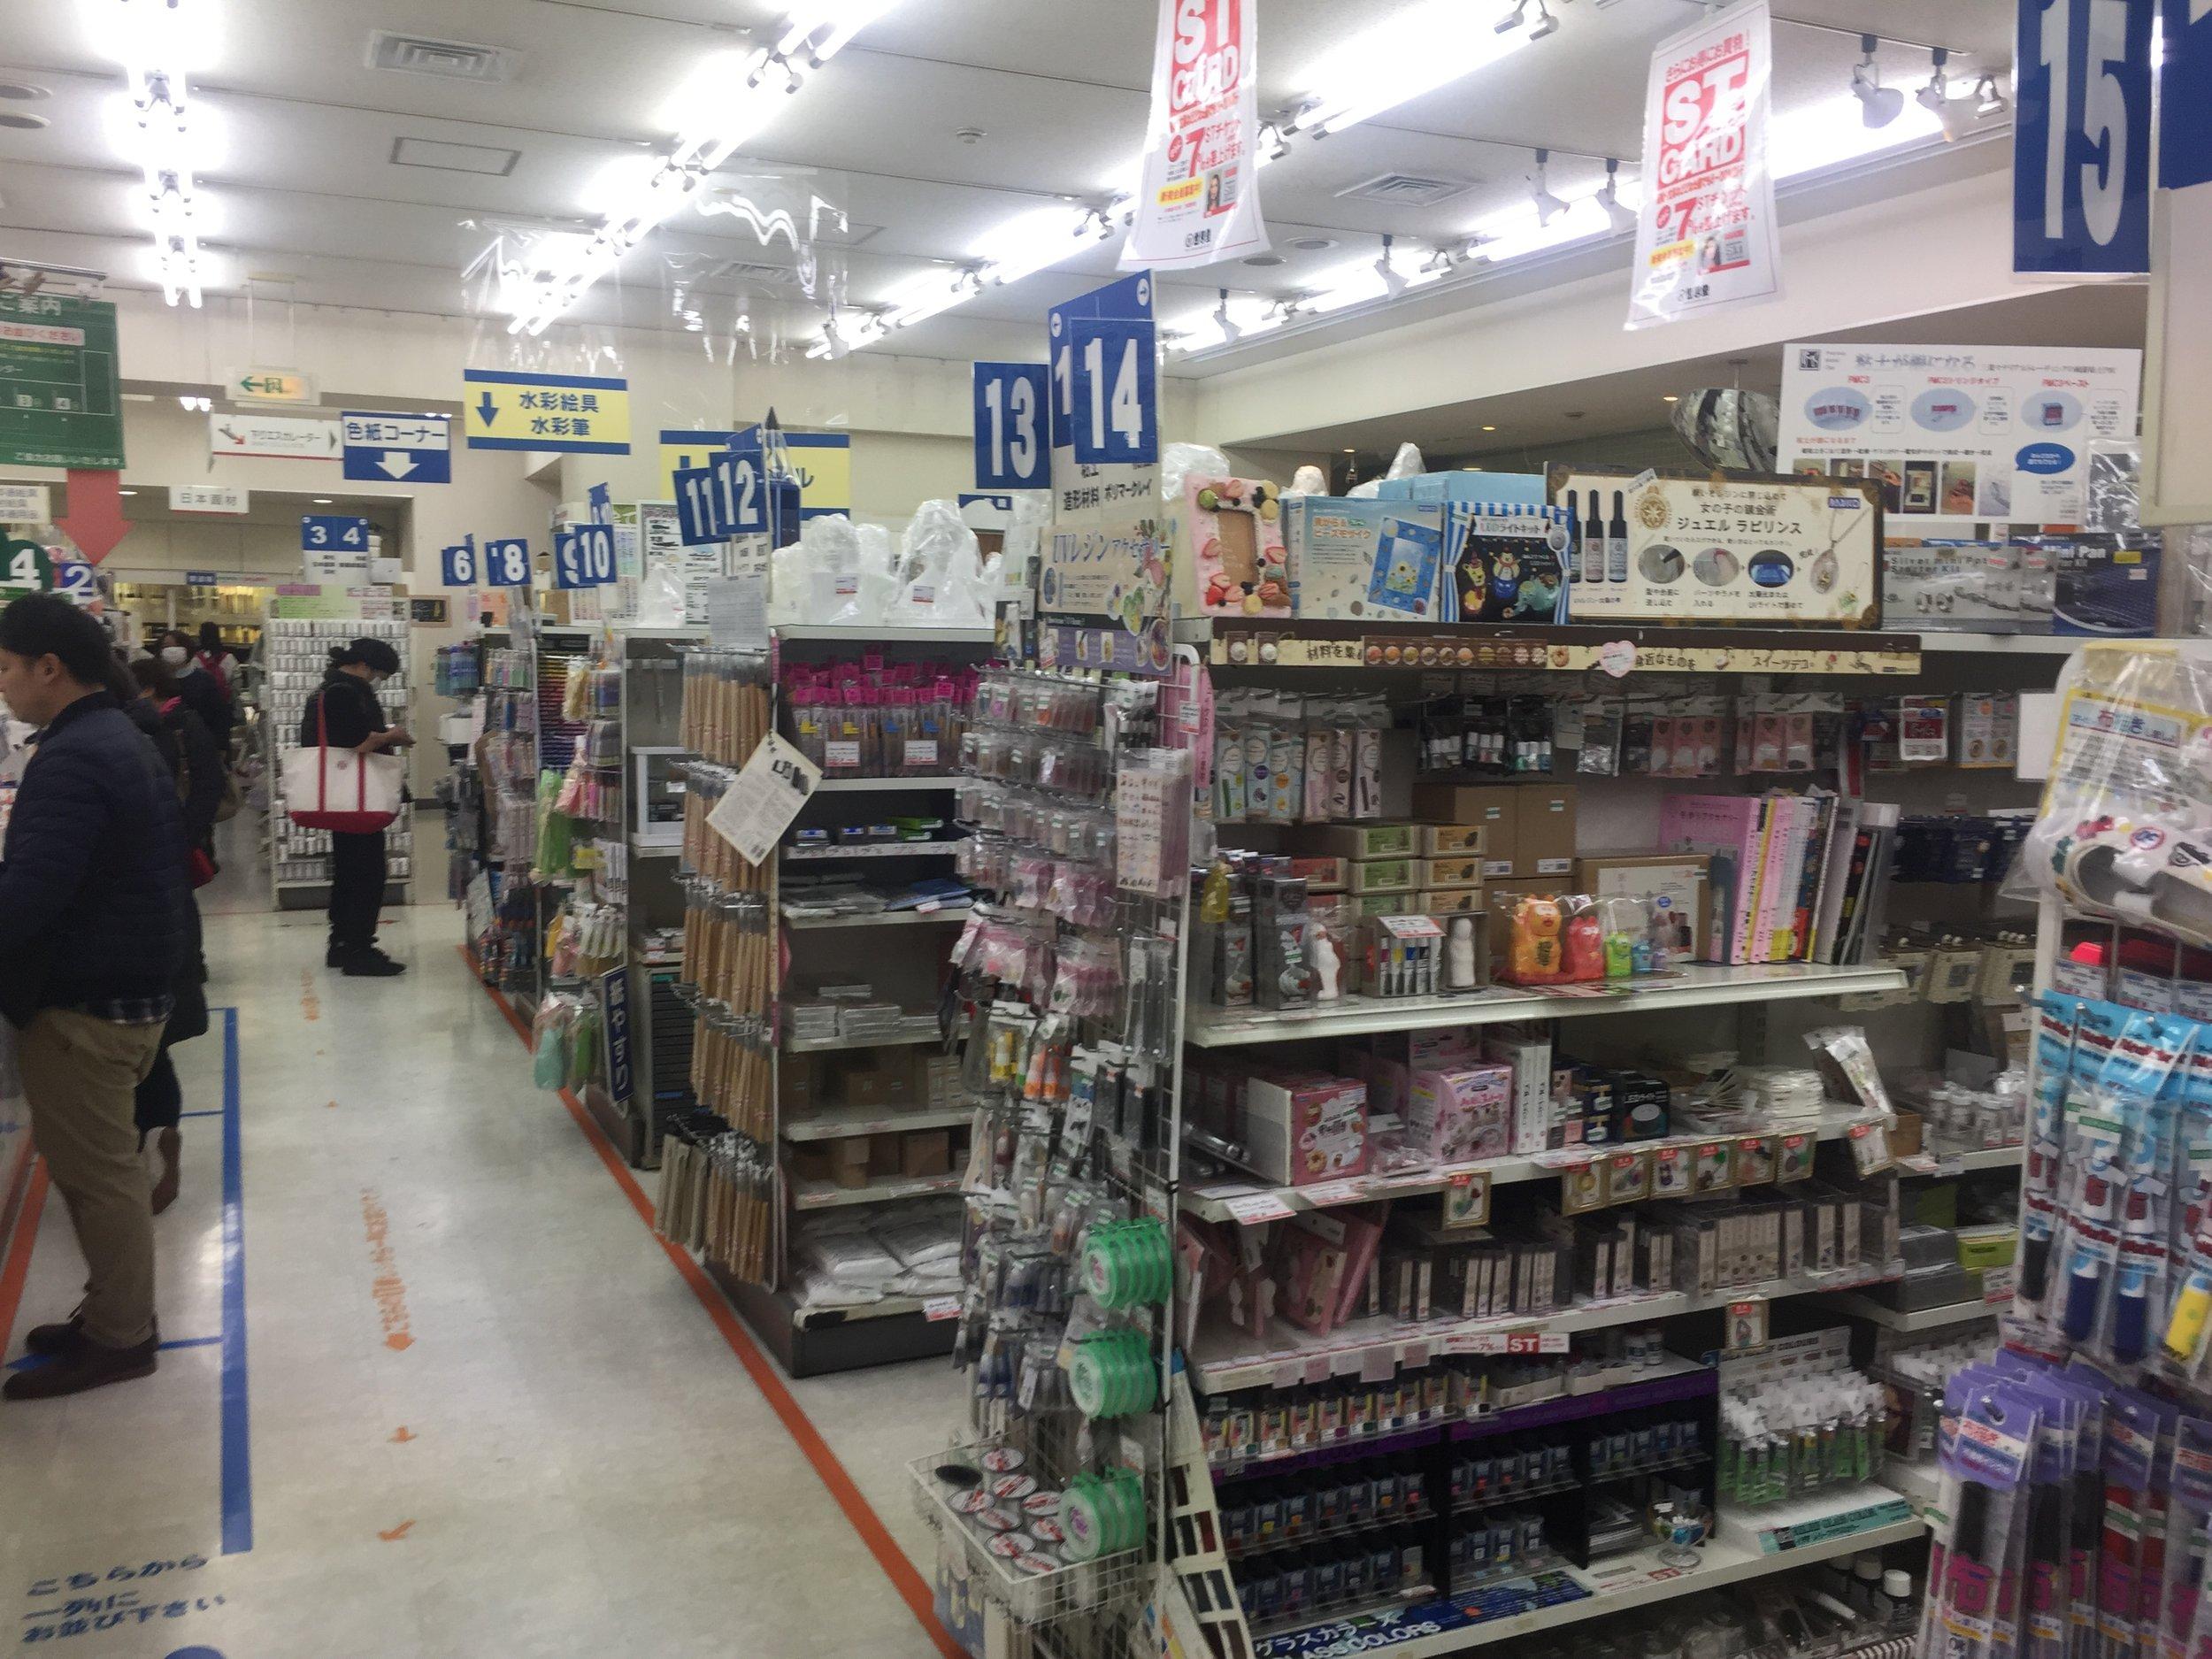 sekaido aisles in tokyo japan art store.JPG